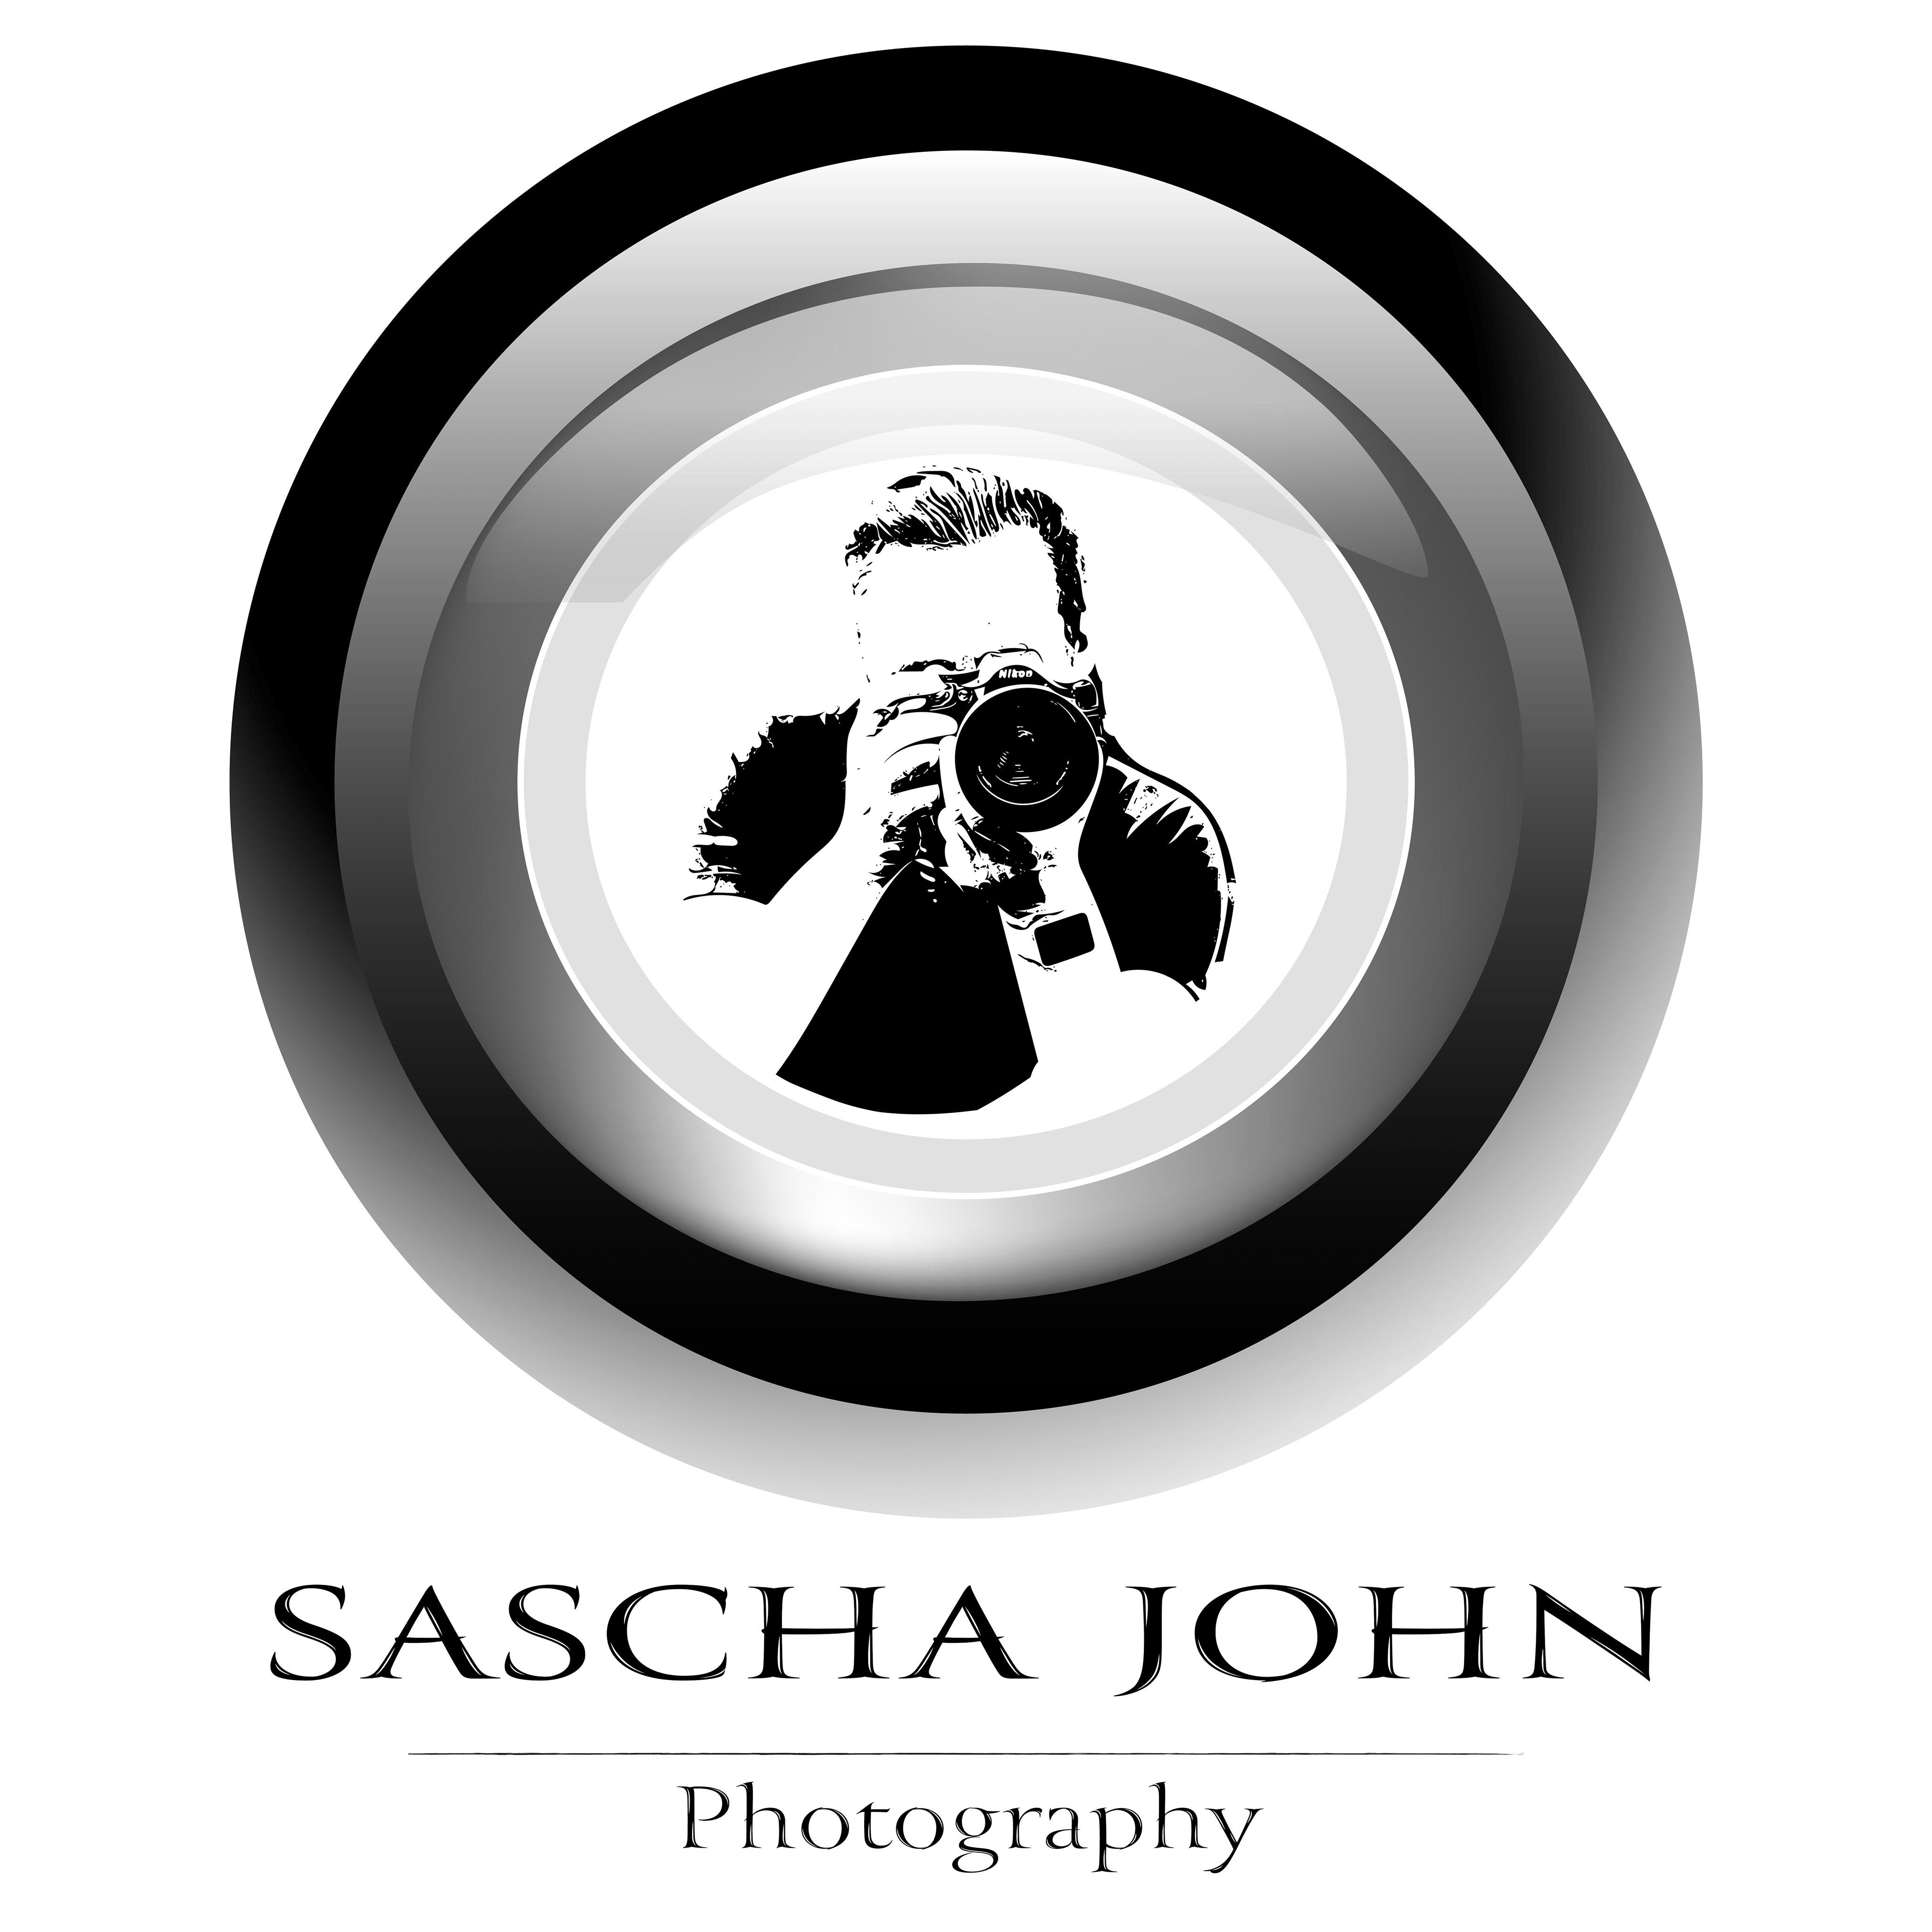 Sascha John Photography